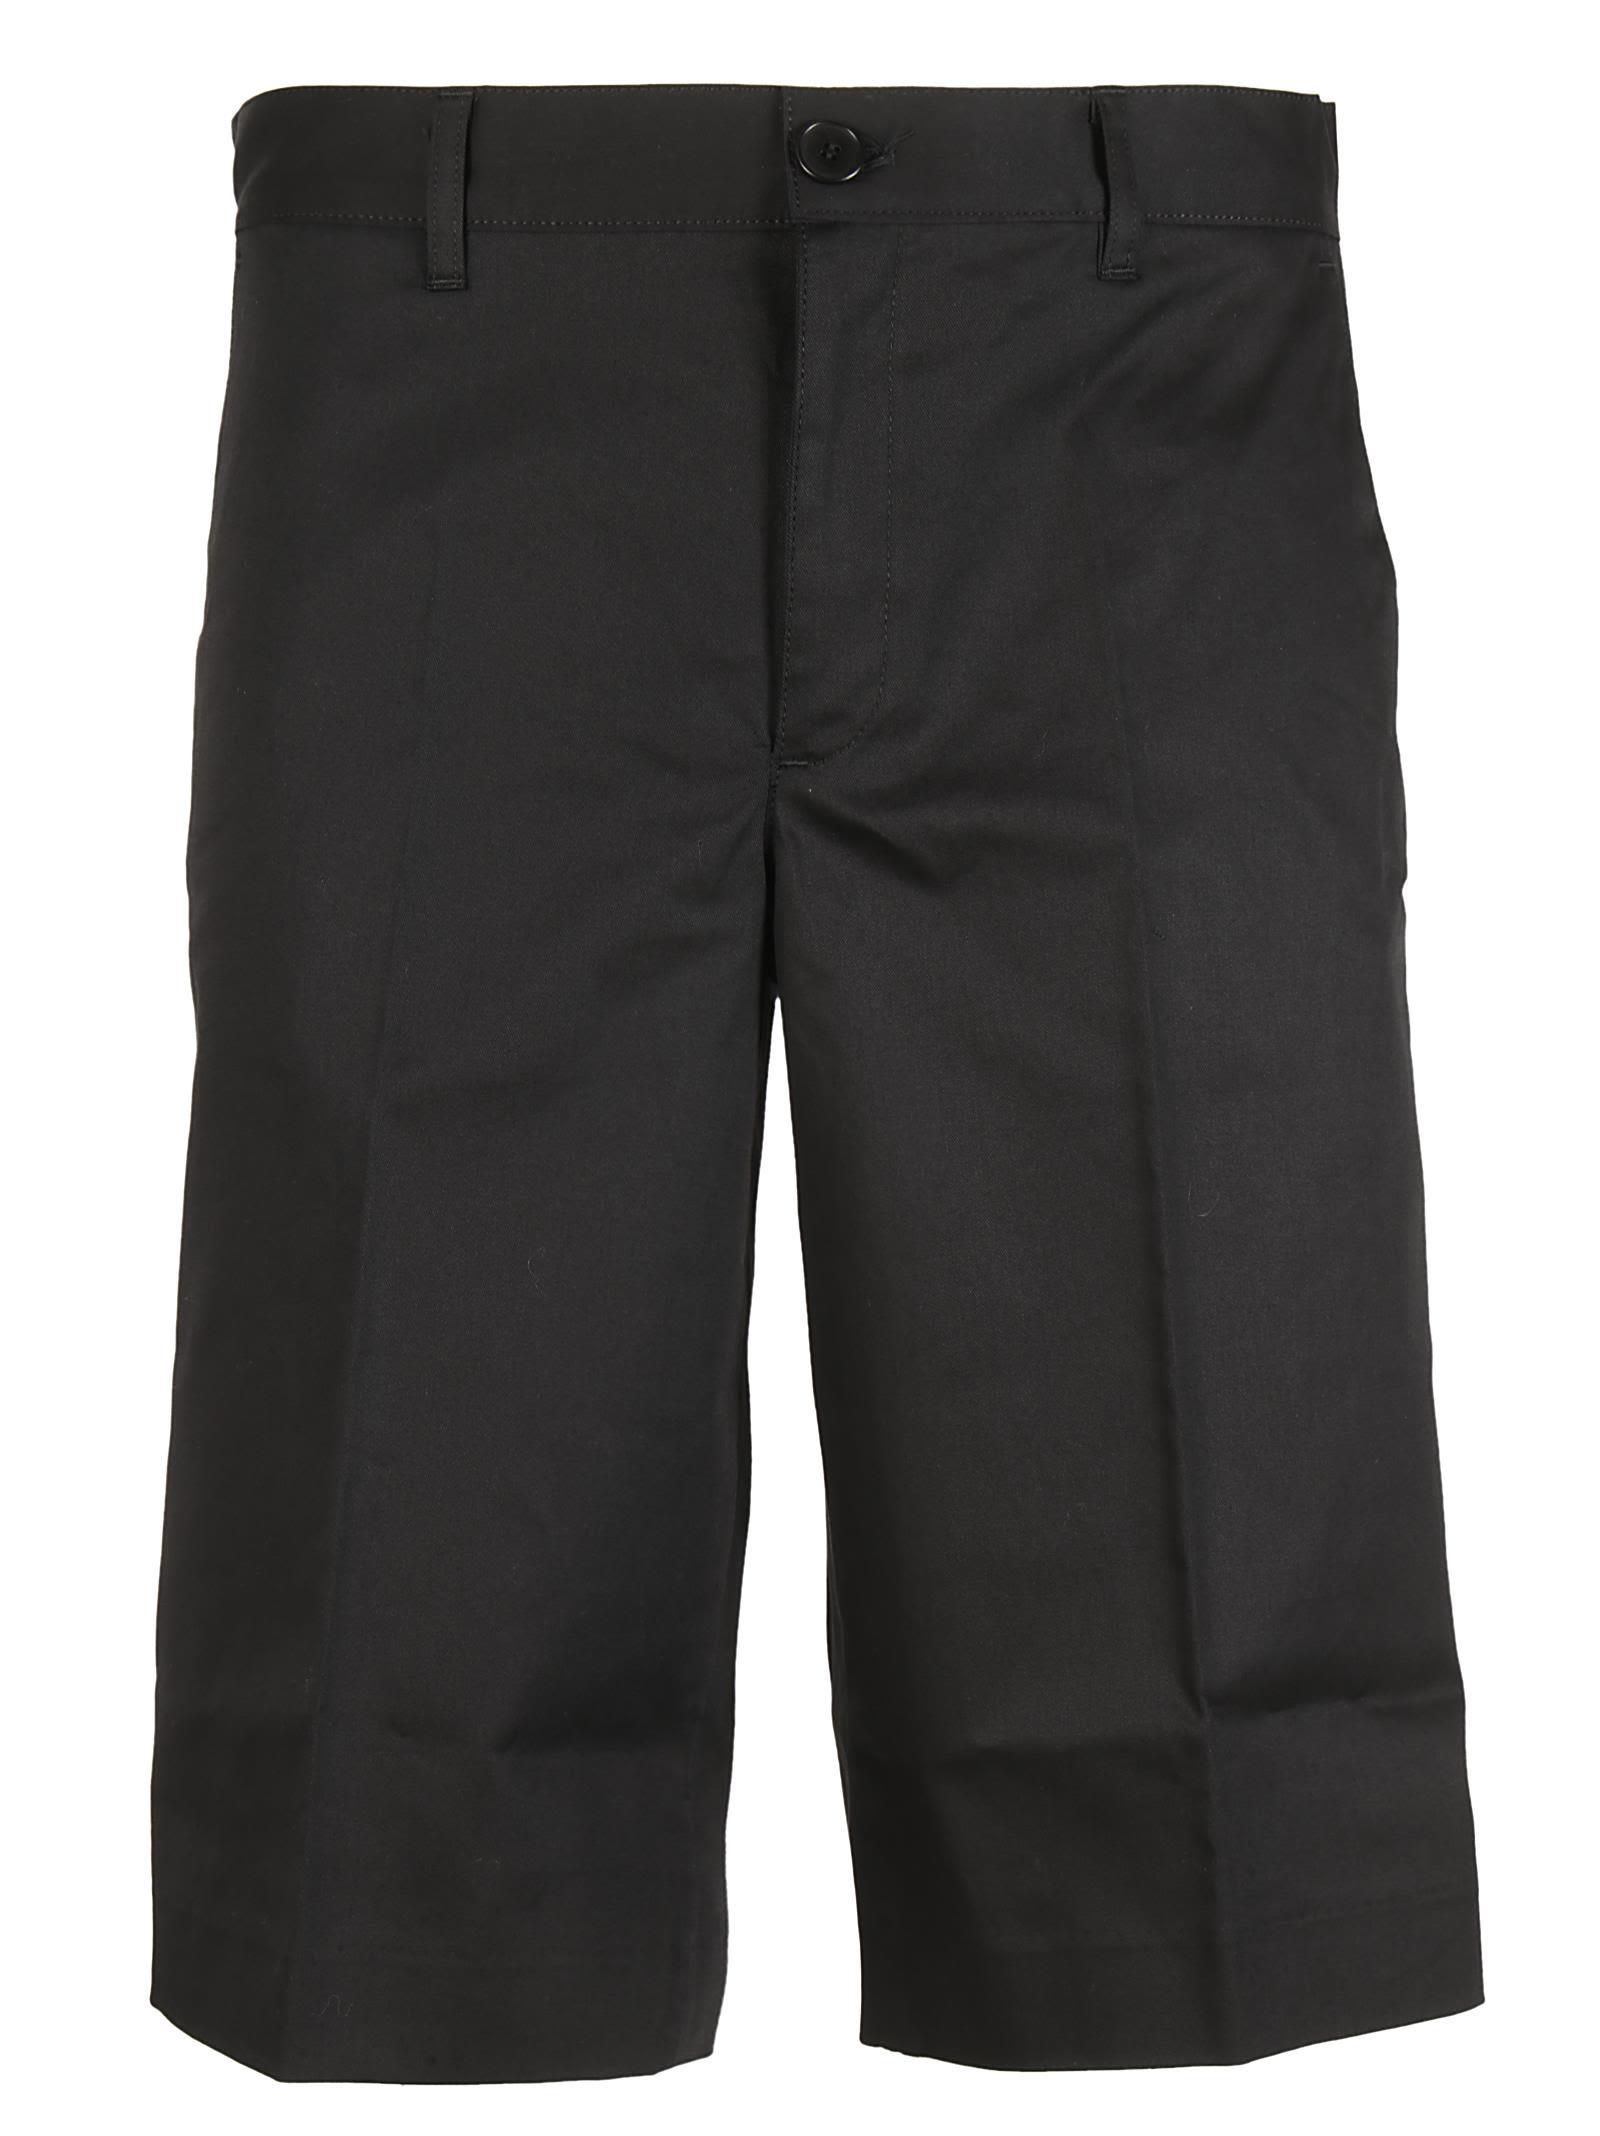 Givenchy Classic Shorts